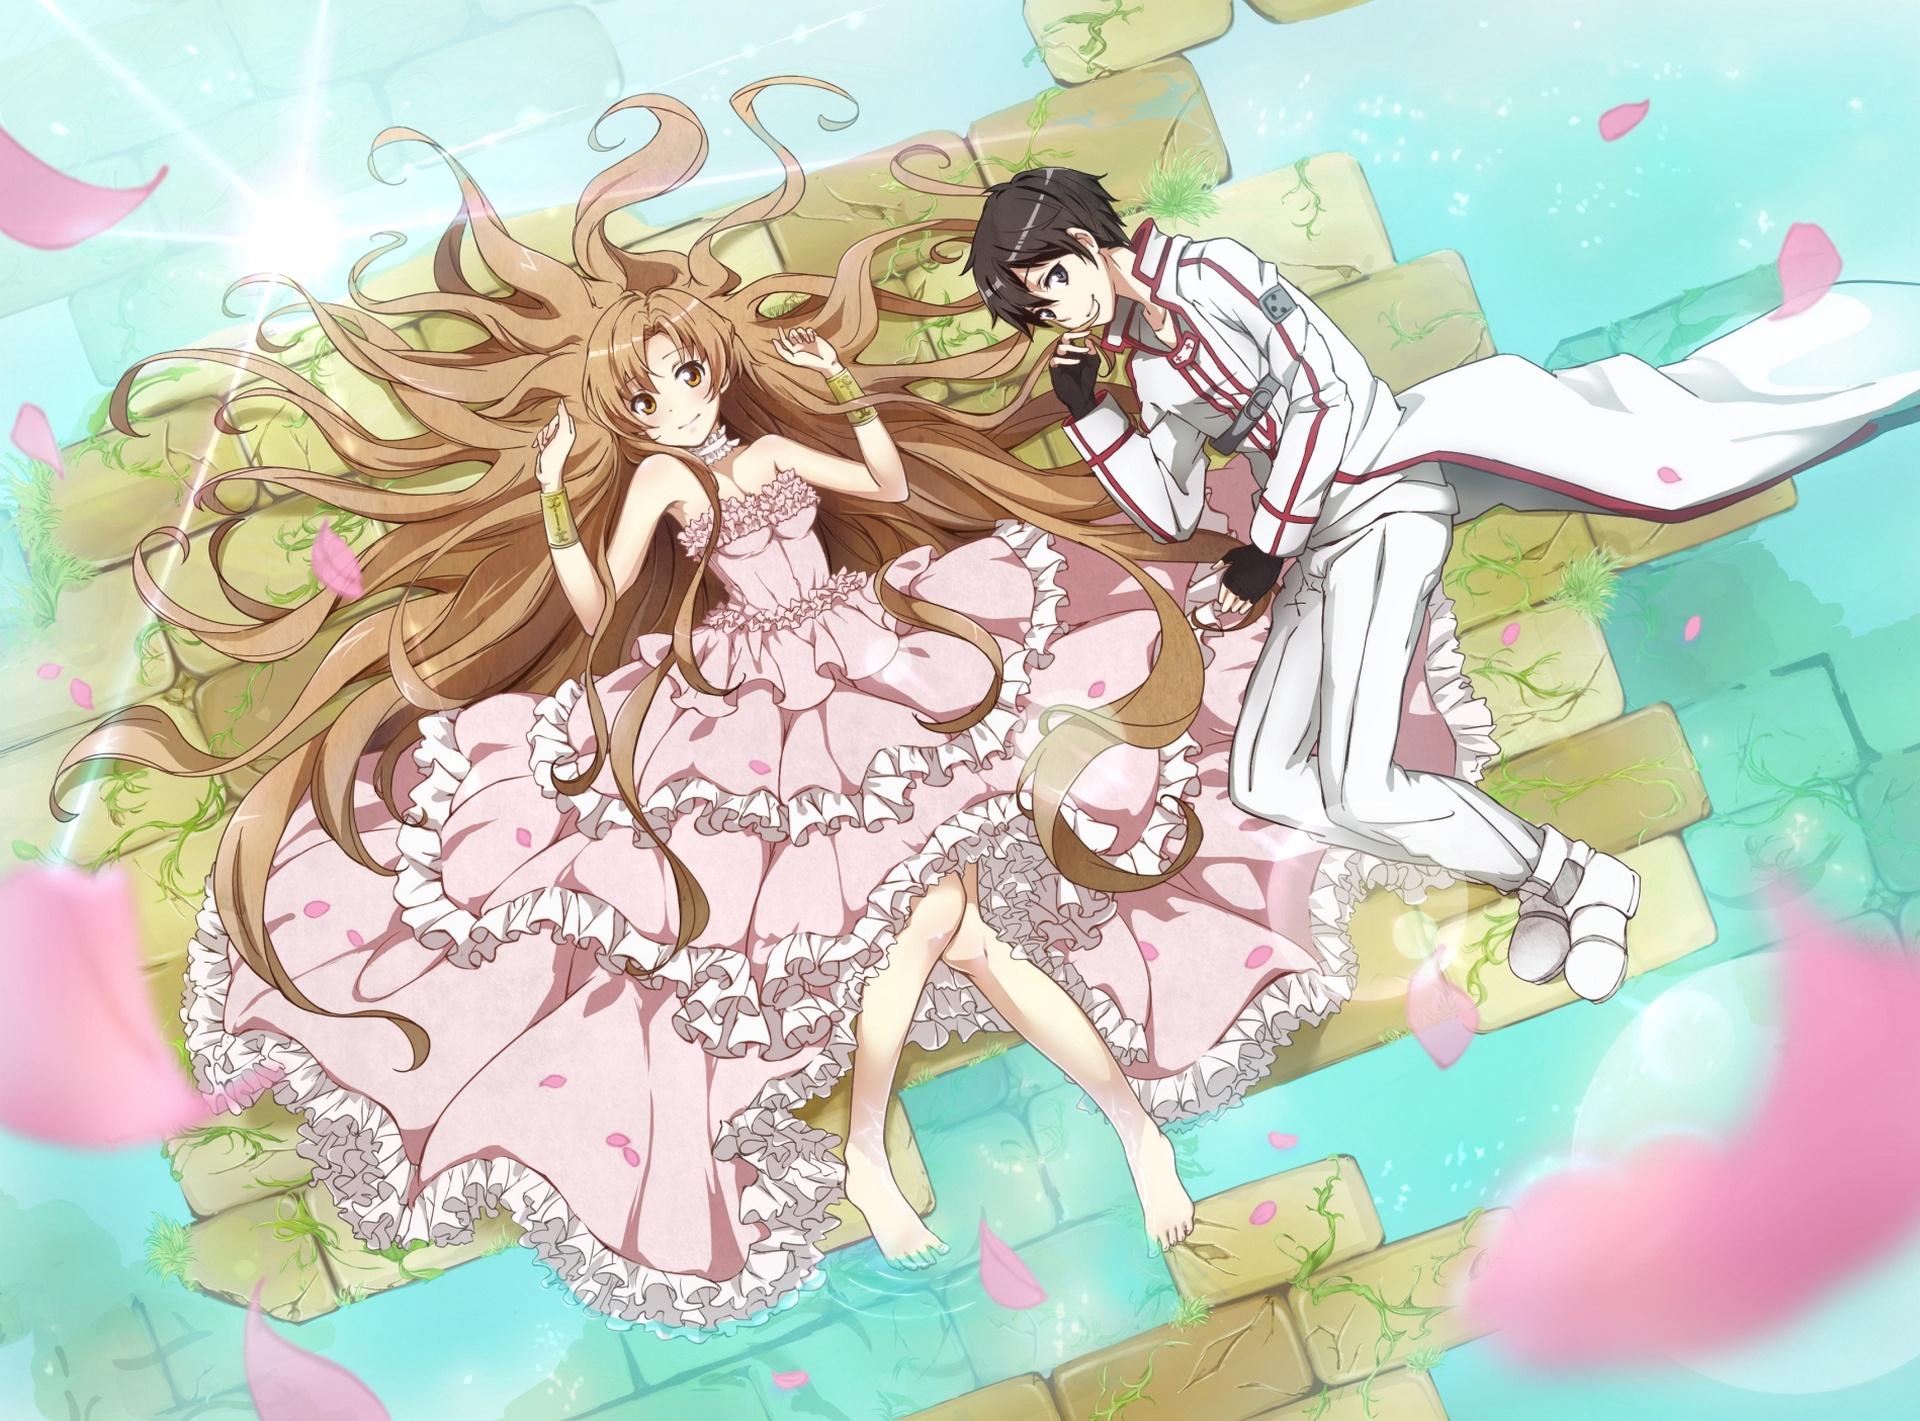 Anime Sword Art Online Asuna Yuuki Kirito Papel de Parede Sword Art Online Wallpaper 1920x1080 Kirito And Asuna